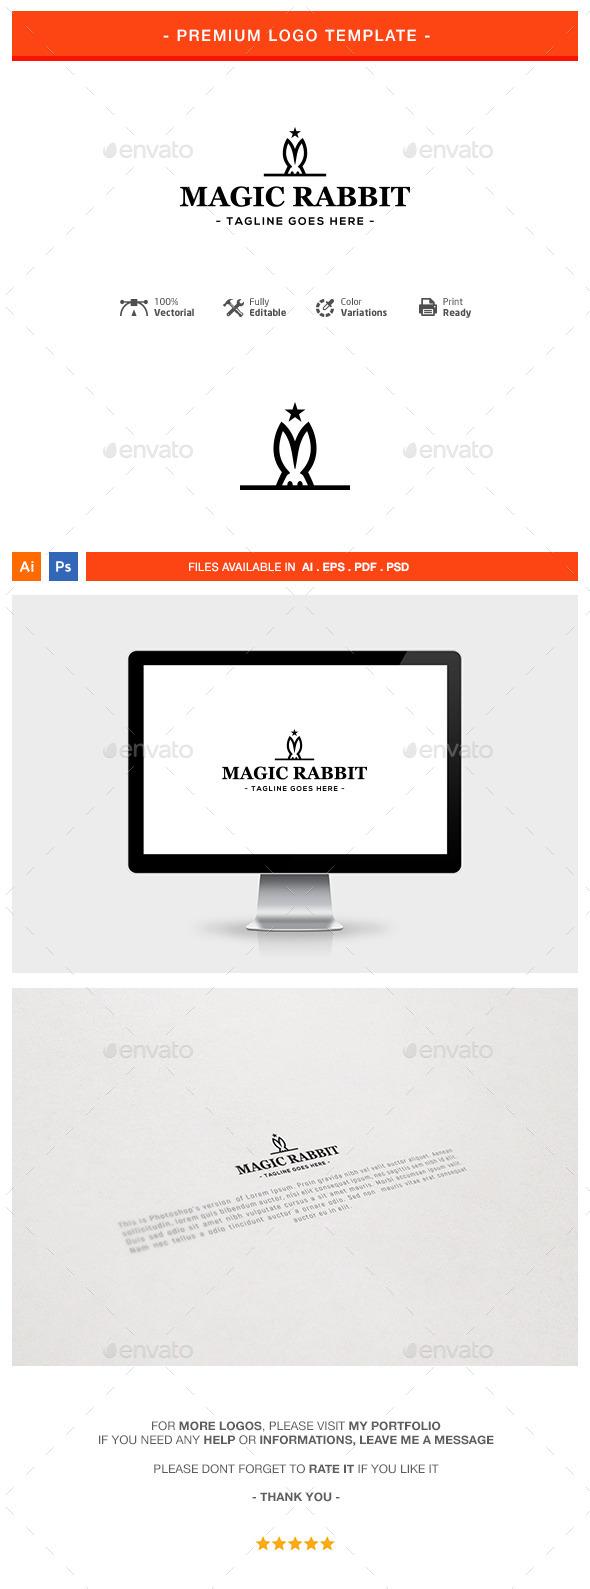 Magic Rabbit Logo Template